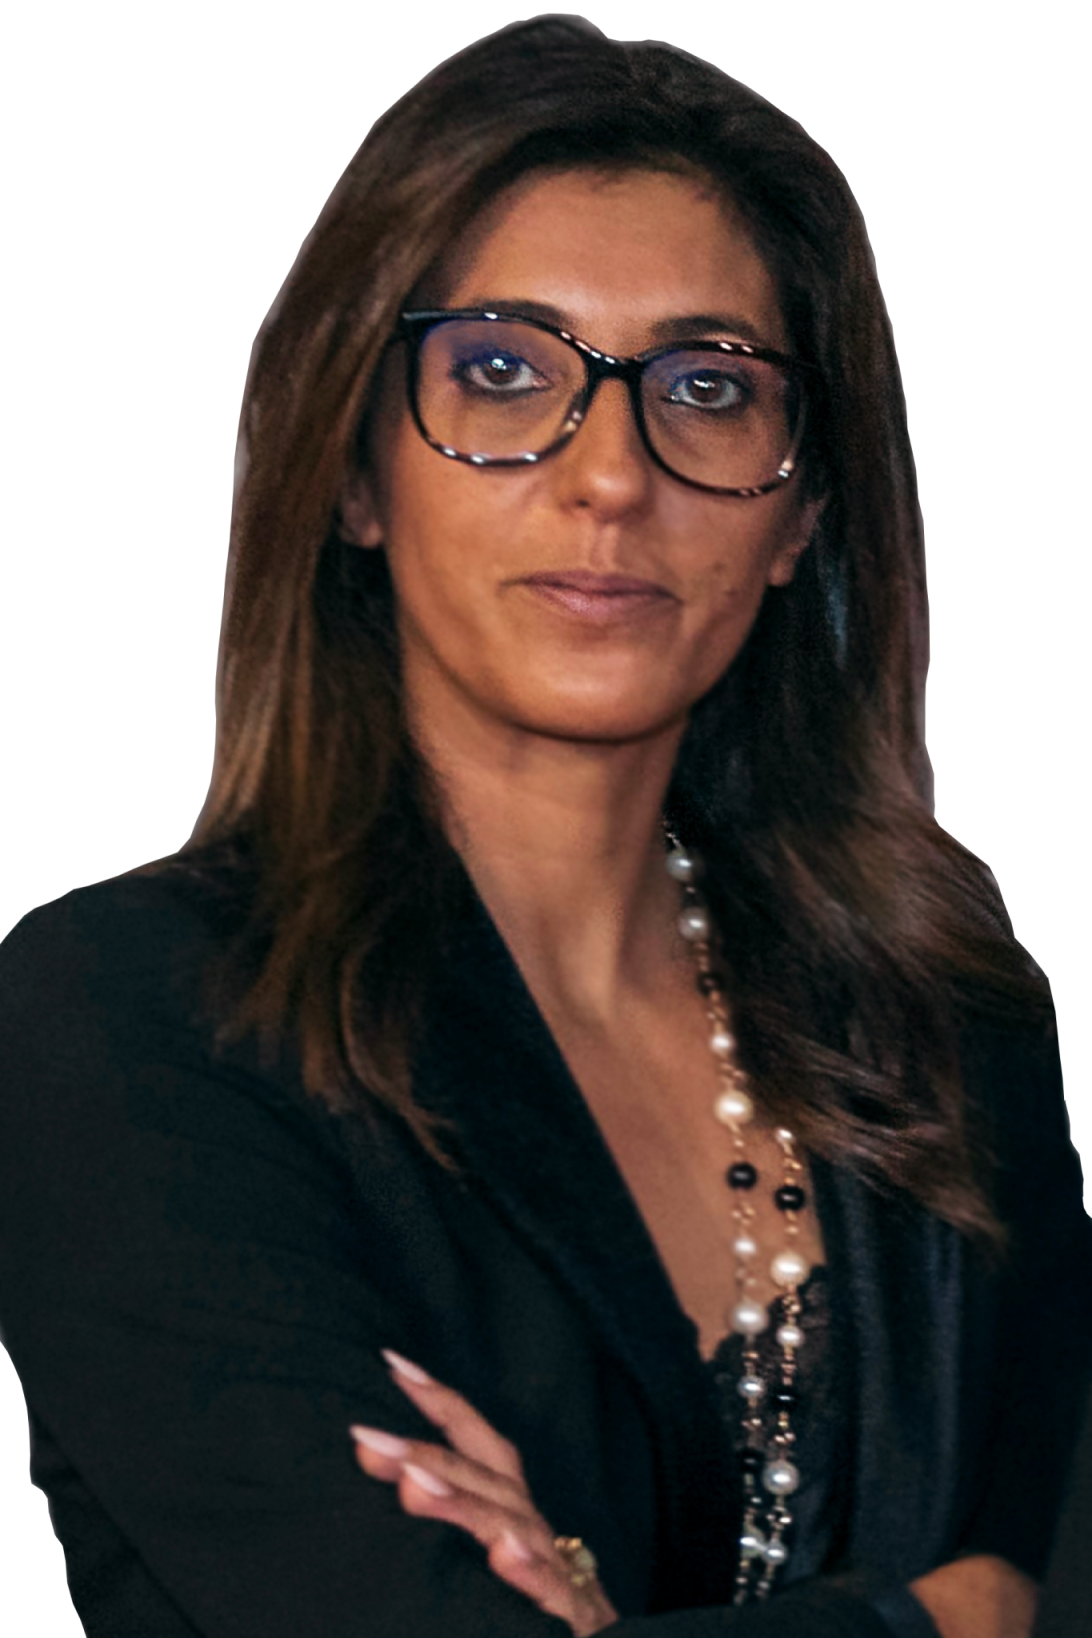 Ana Vaz Pinheiro